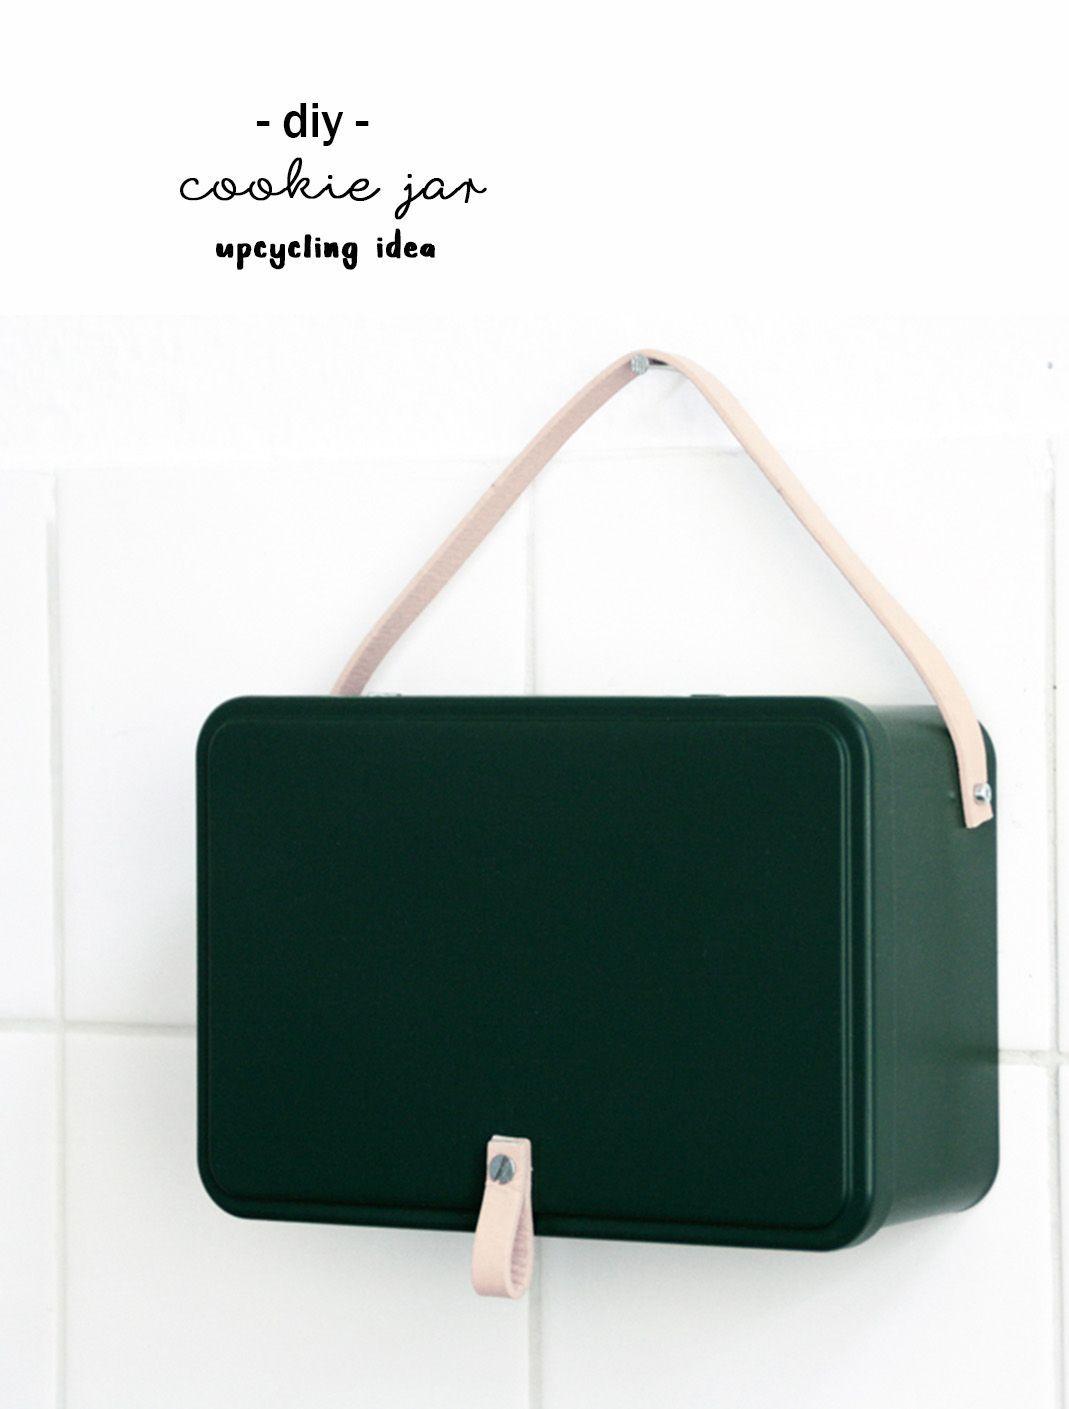 Diy Idee Keksdosen Upcycling Mit Leder Und Gruner Farbe